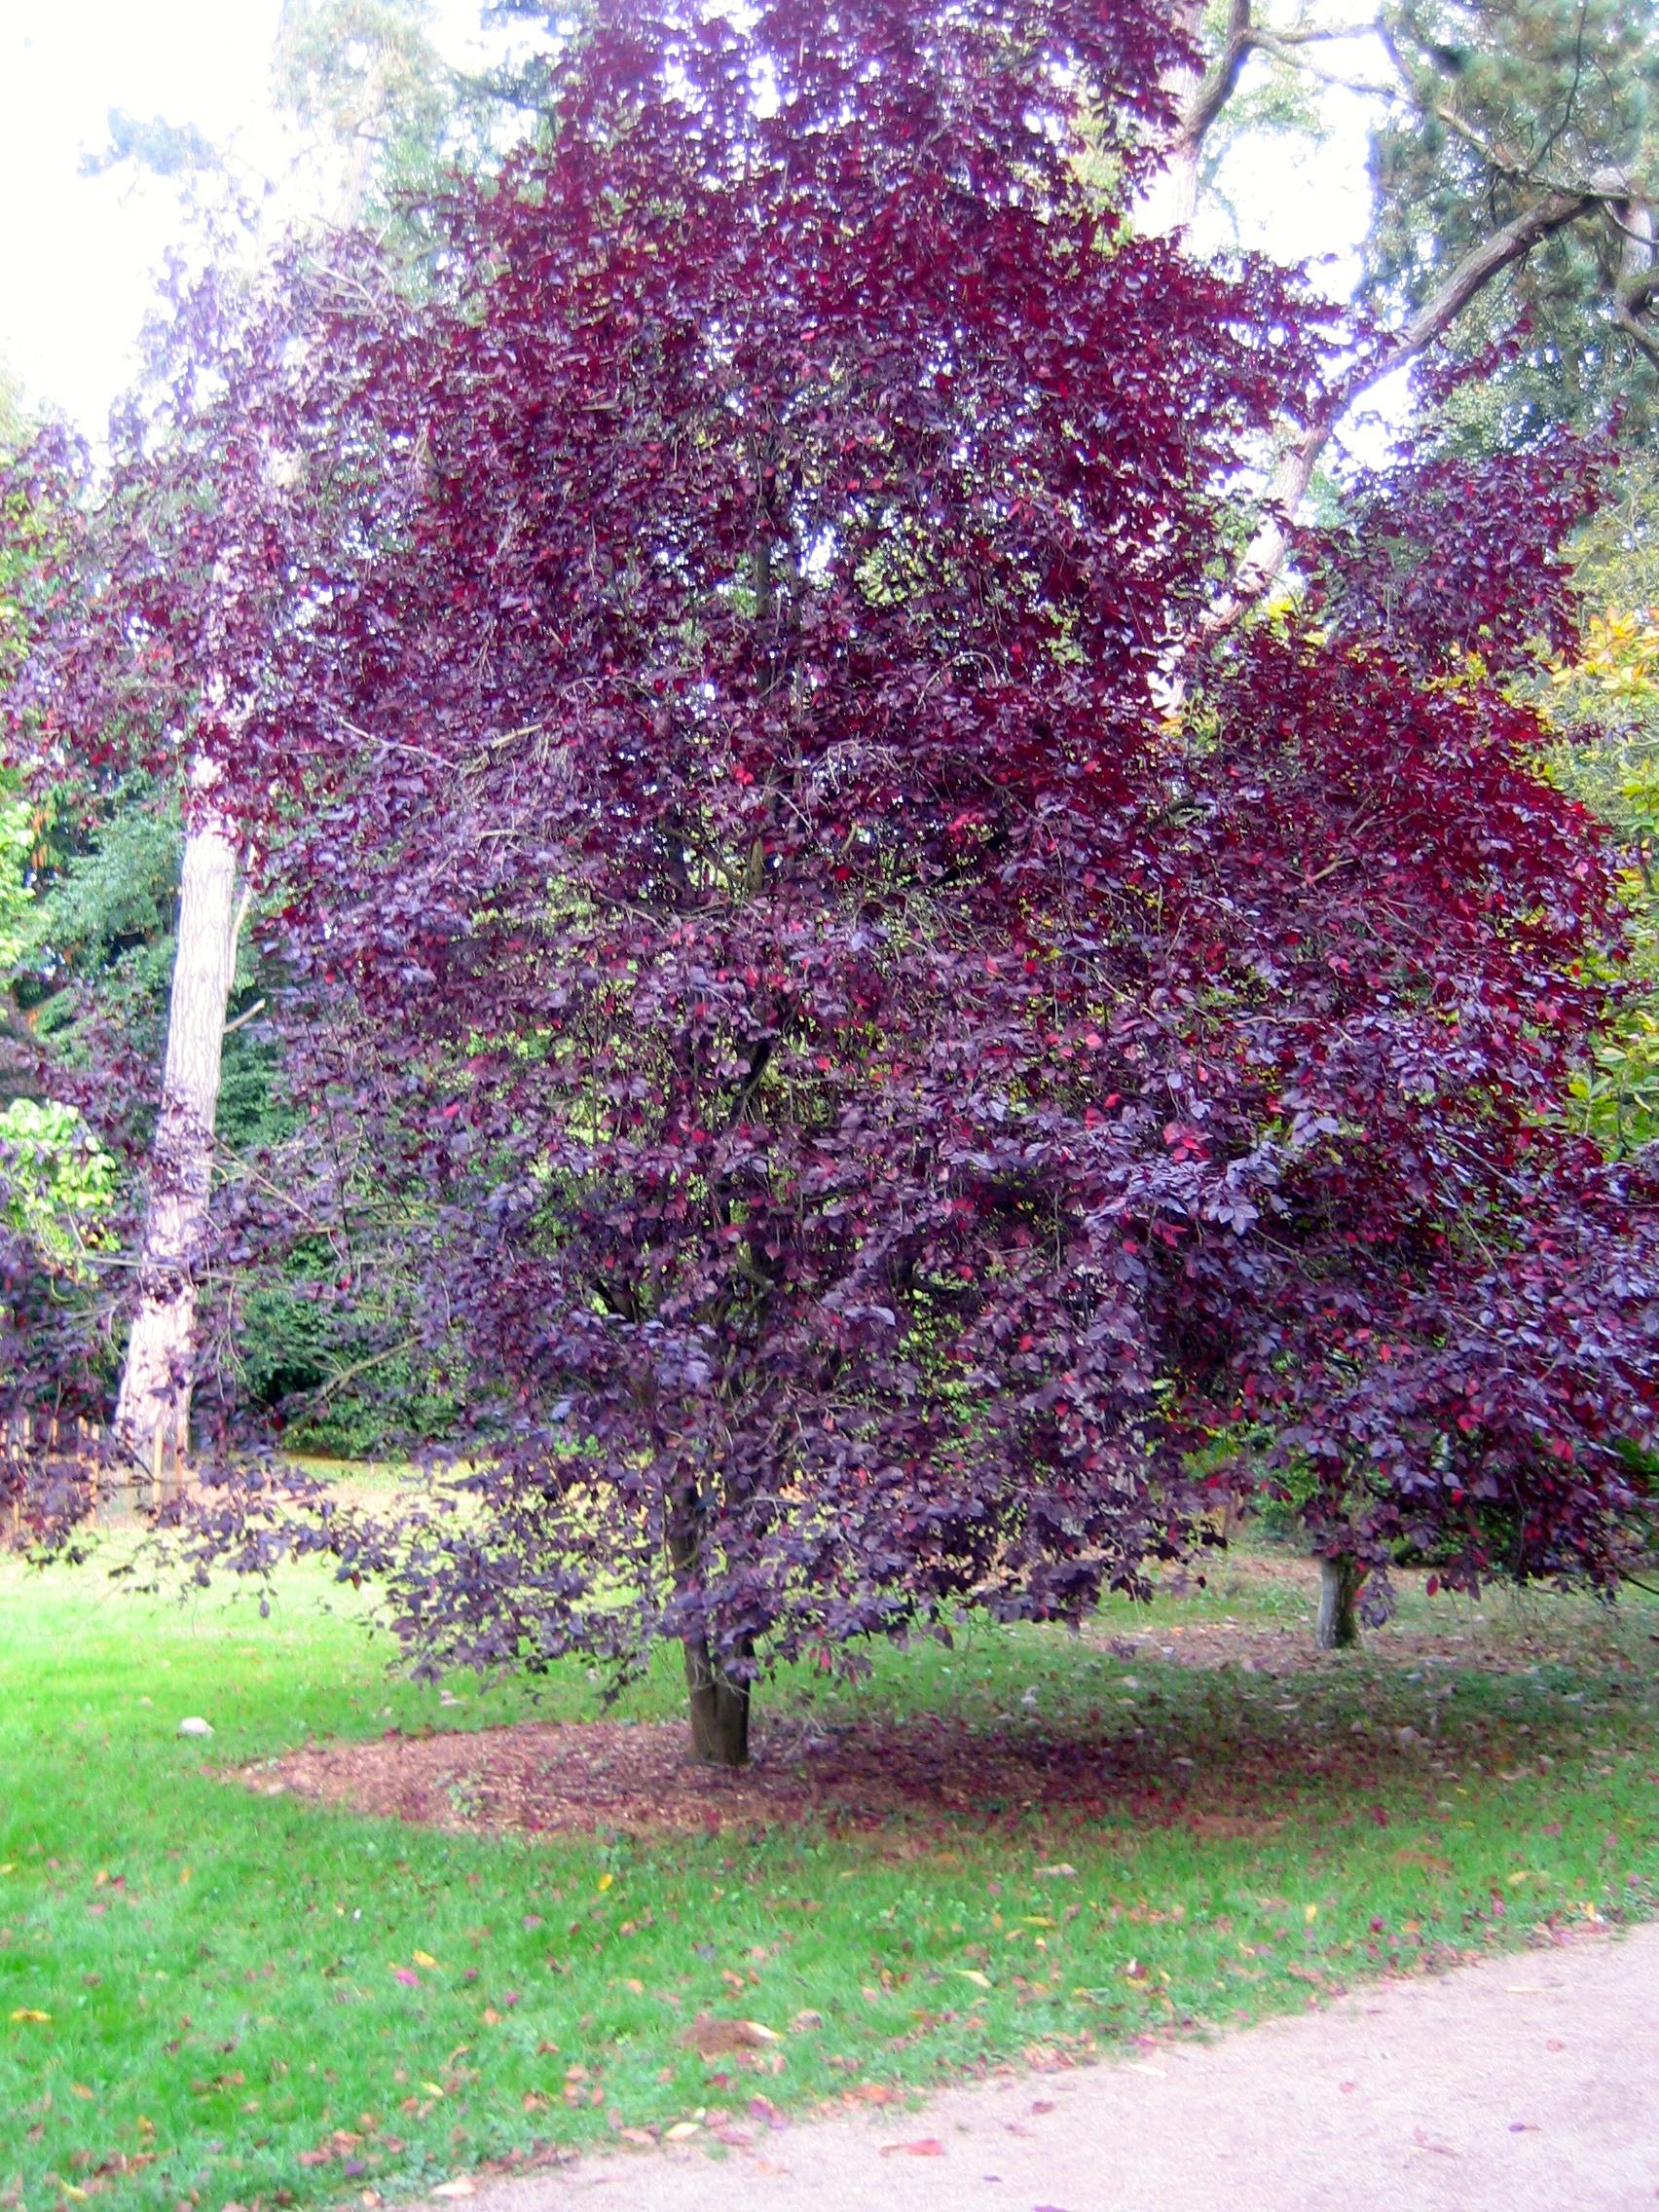 Cherry Plum has a very vibrant colour